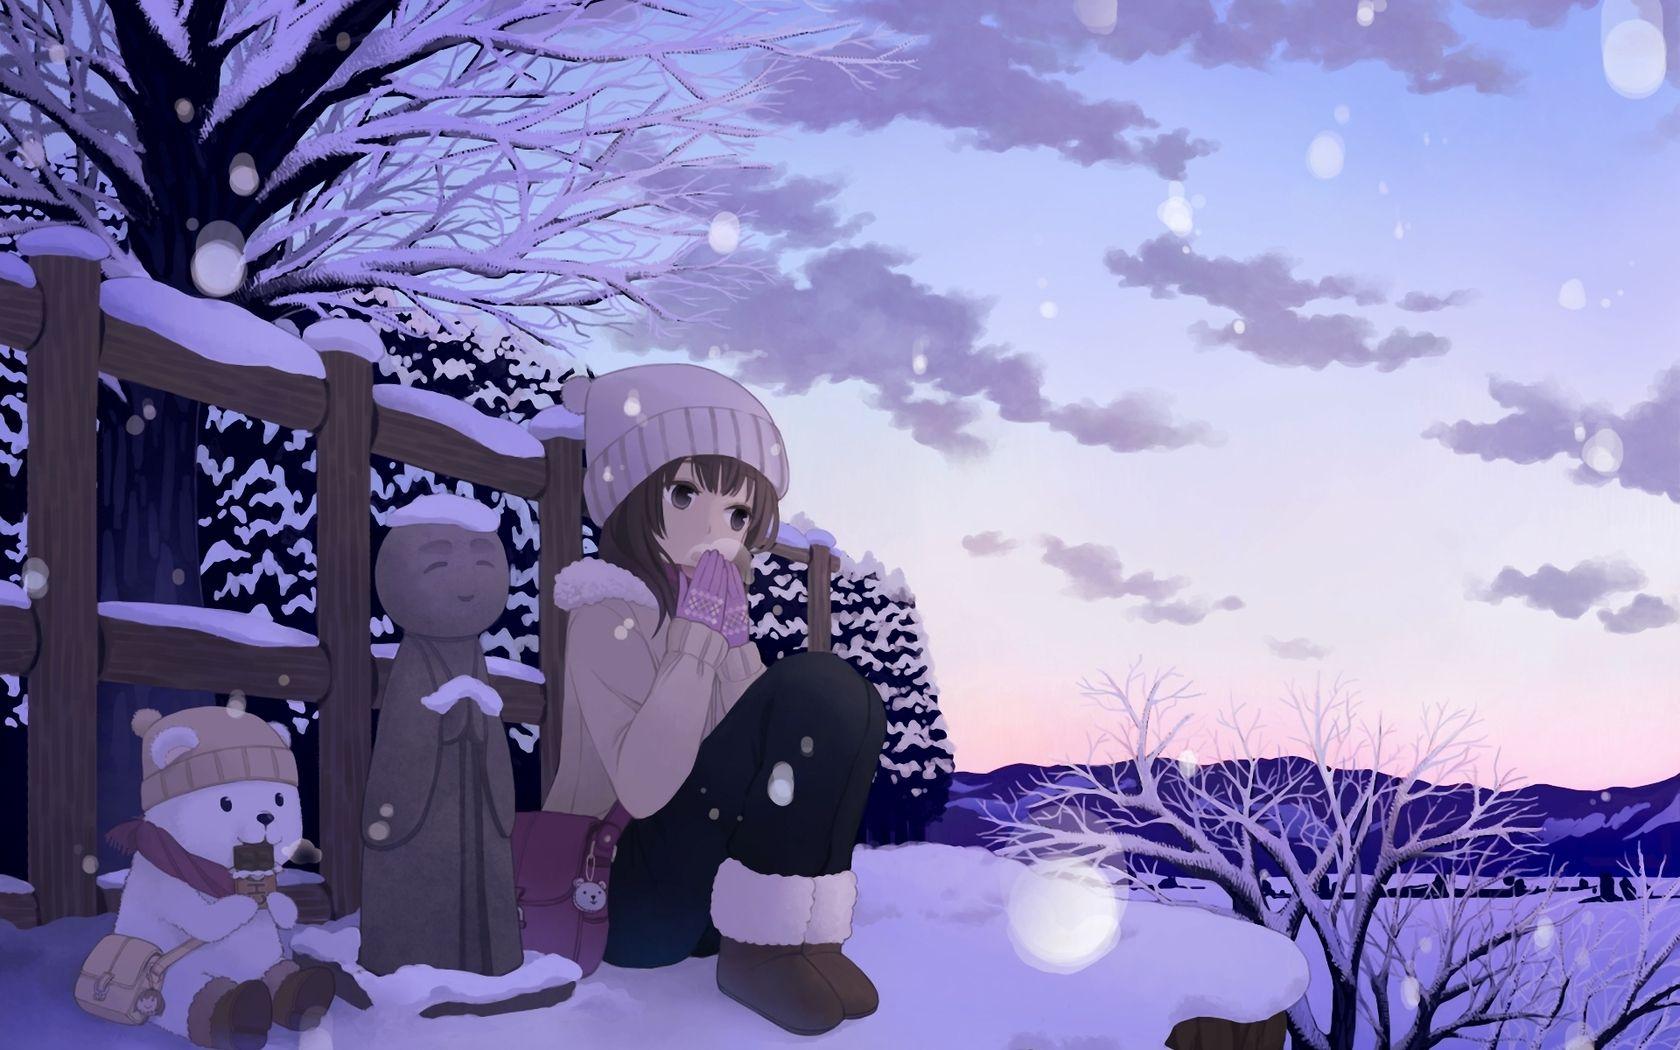 Anime Winter Wallpaper 42573 1680x1050 Px Anime Art Beautiful Cute Anime Wallpaper Anime Wallpaper